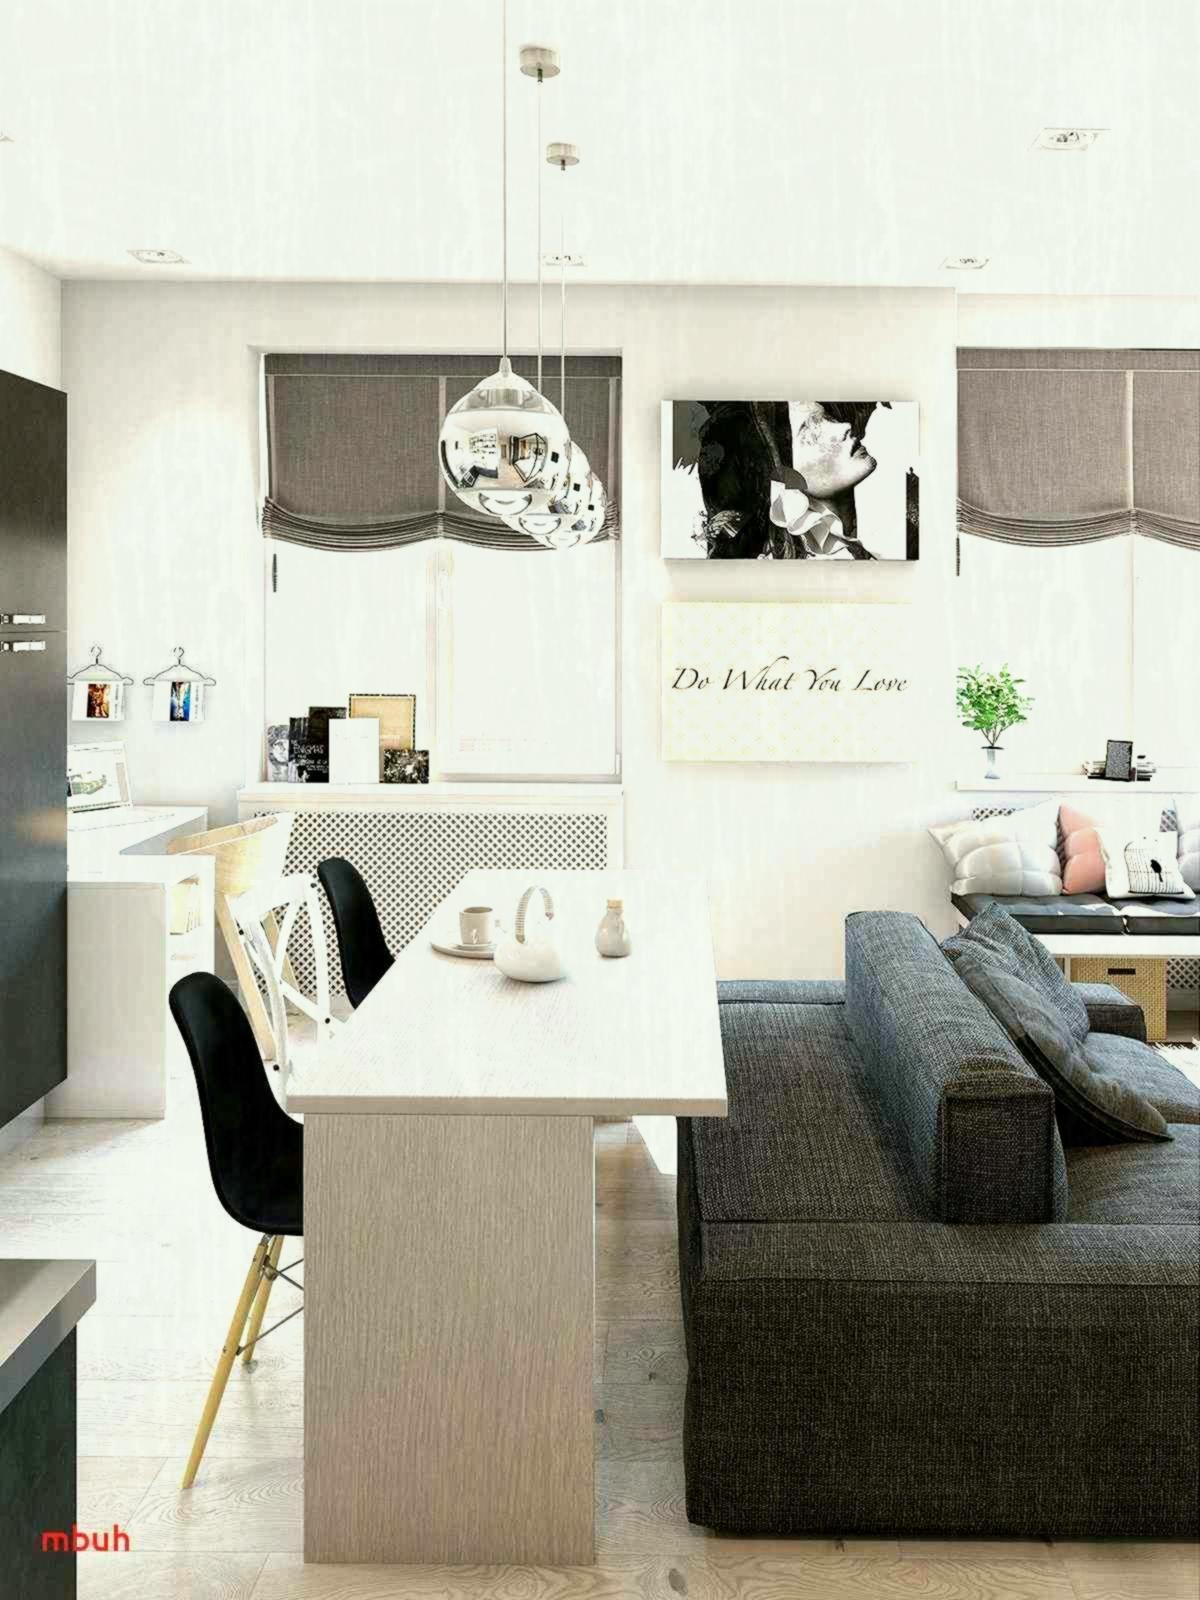 Medium Size of Cute Cheap Bedroom Decorating Ideas Diy Simple Decor Accents Amazing Elegant Best Dorm